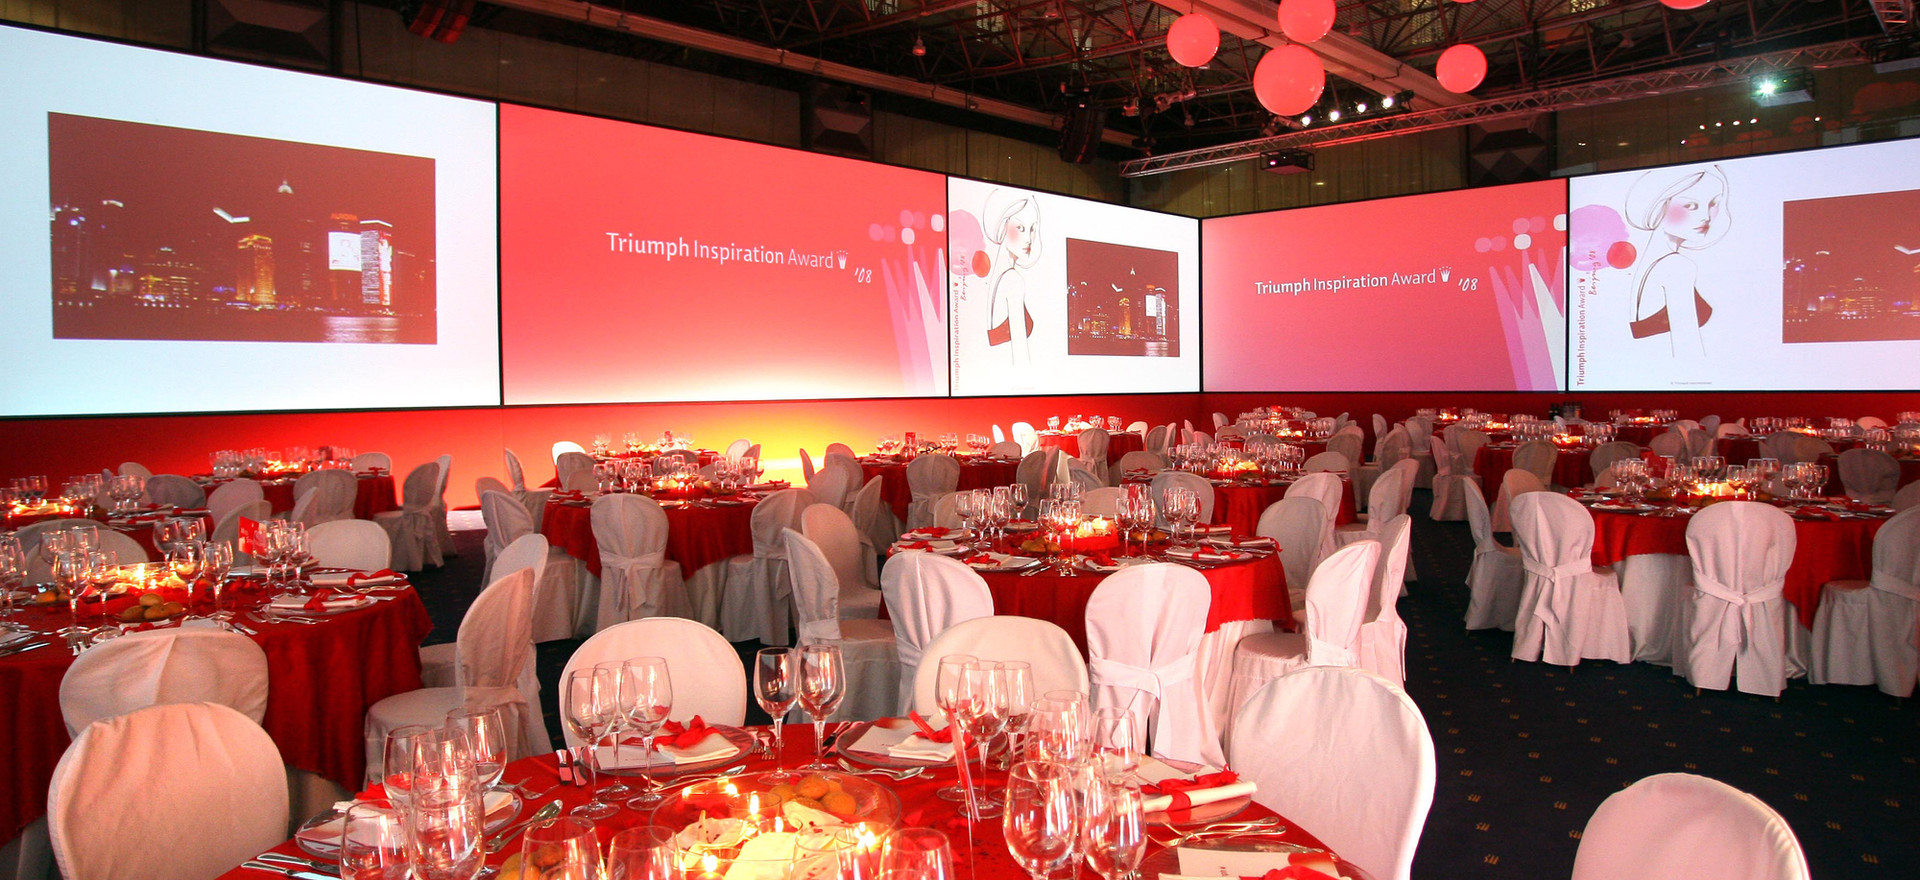 Gala Dinner Set-up